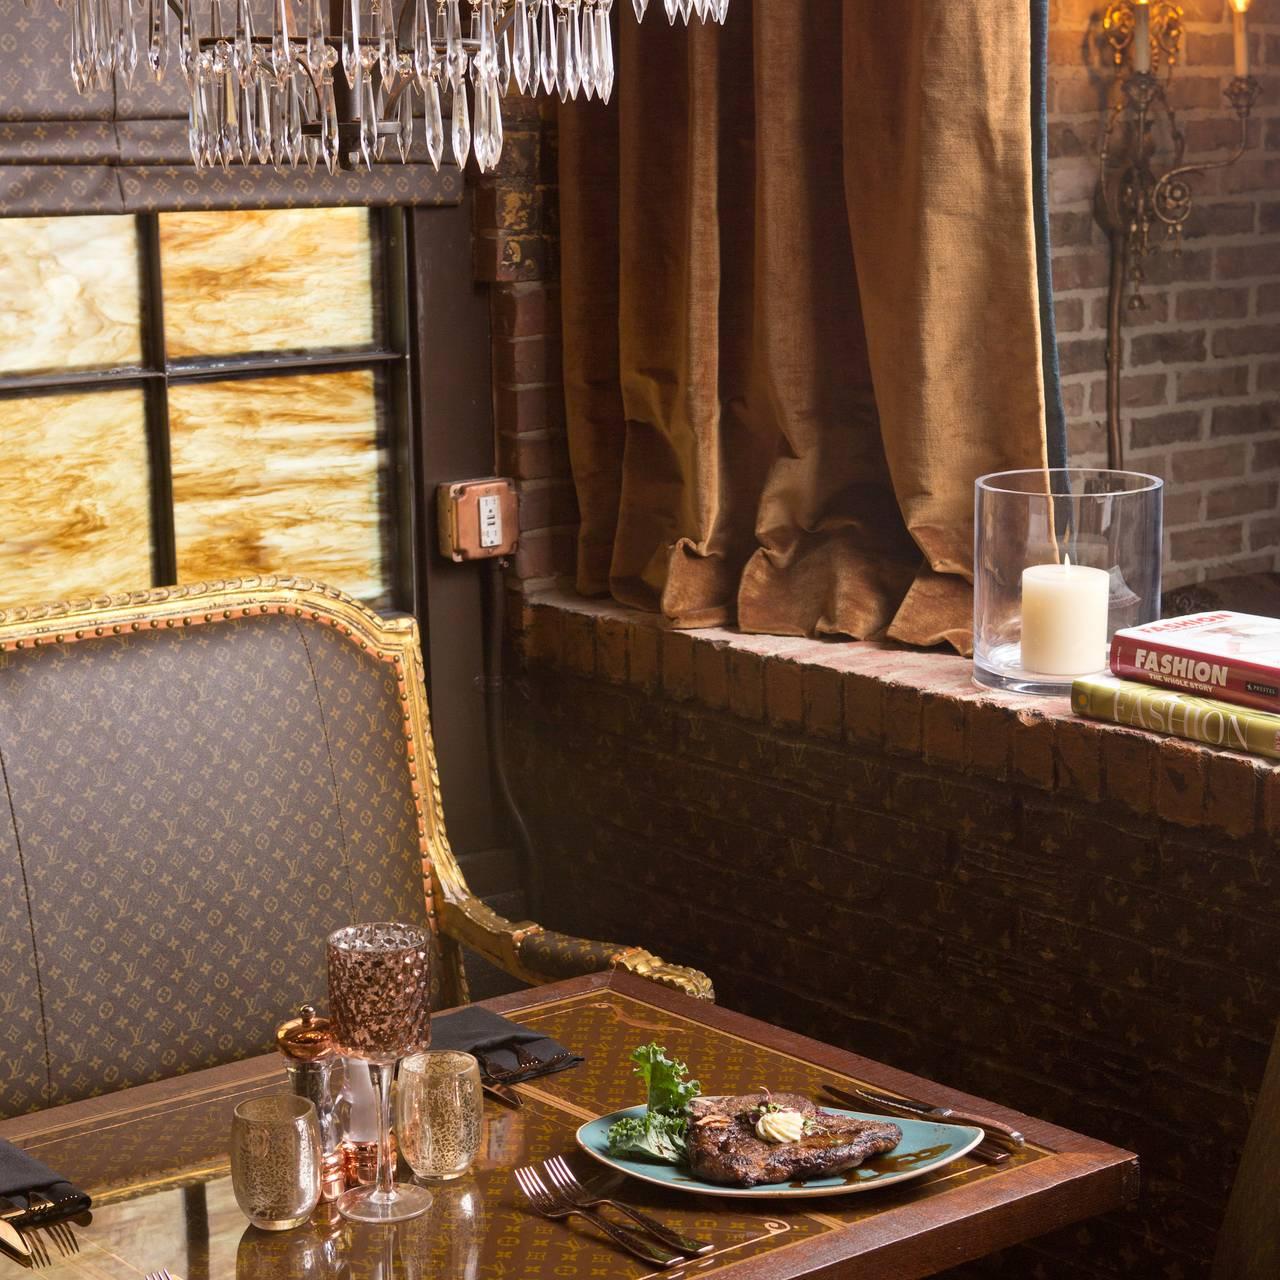 Le Moo Restaurant - Louisville, KY | OpenTable